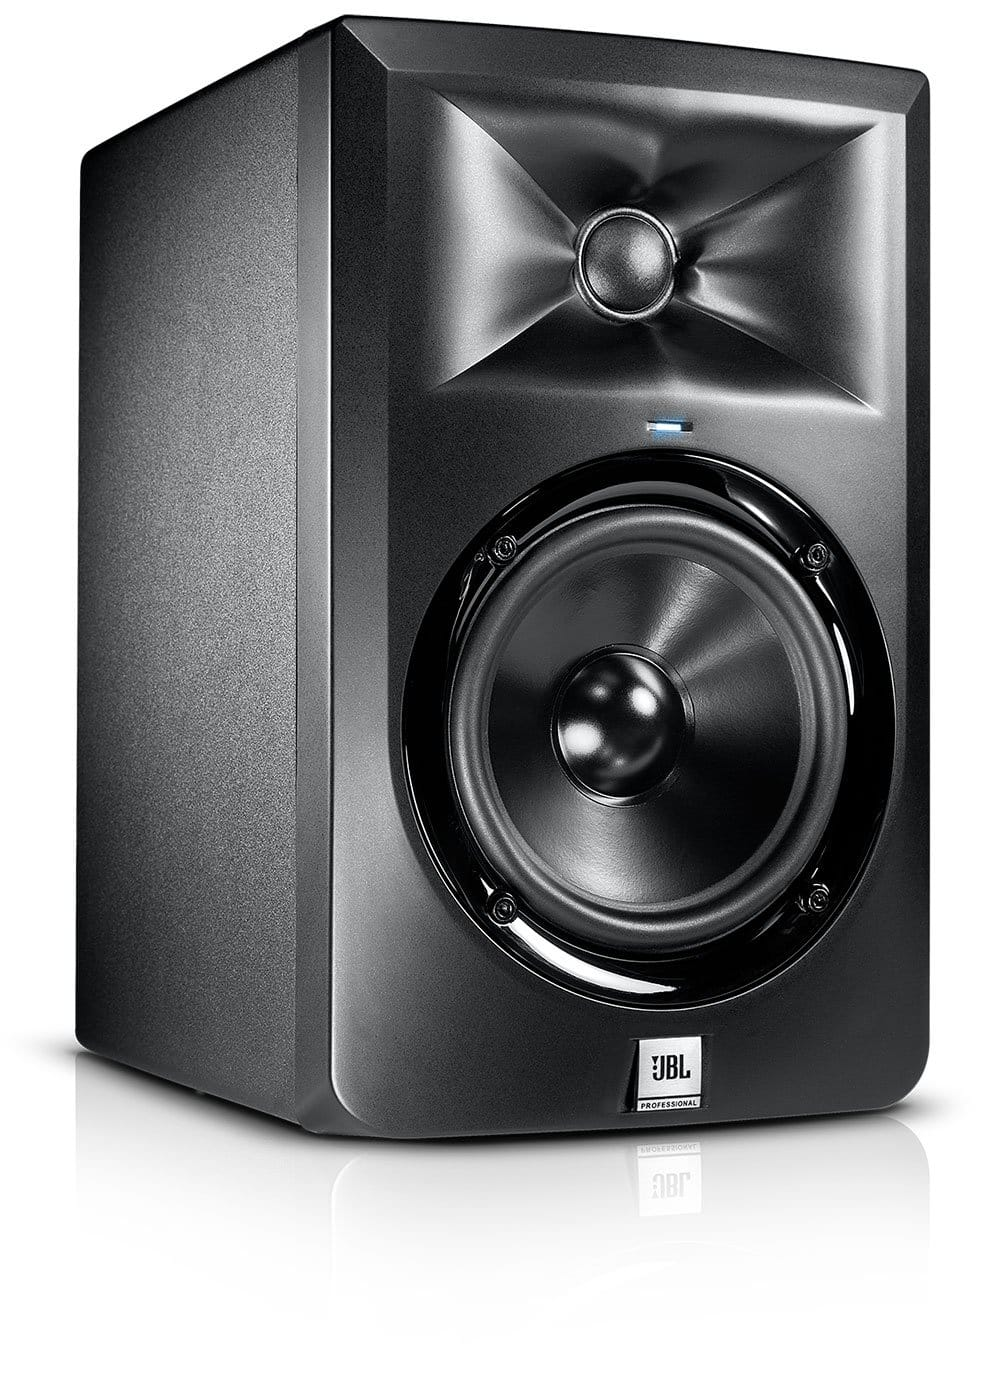 JBL Professional LSR305 Powered Studio Monitor Speaker - $89.00  at Amazon